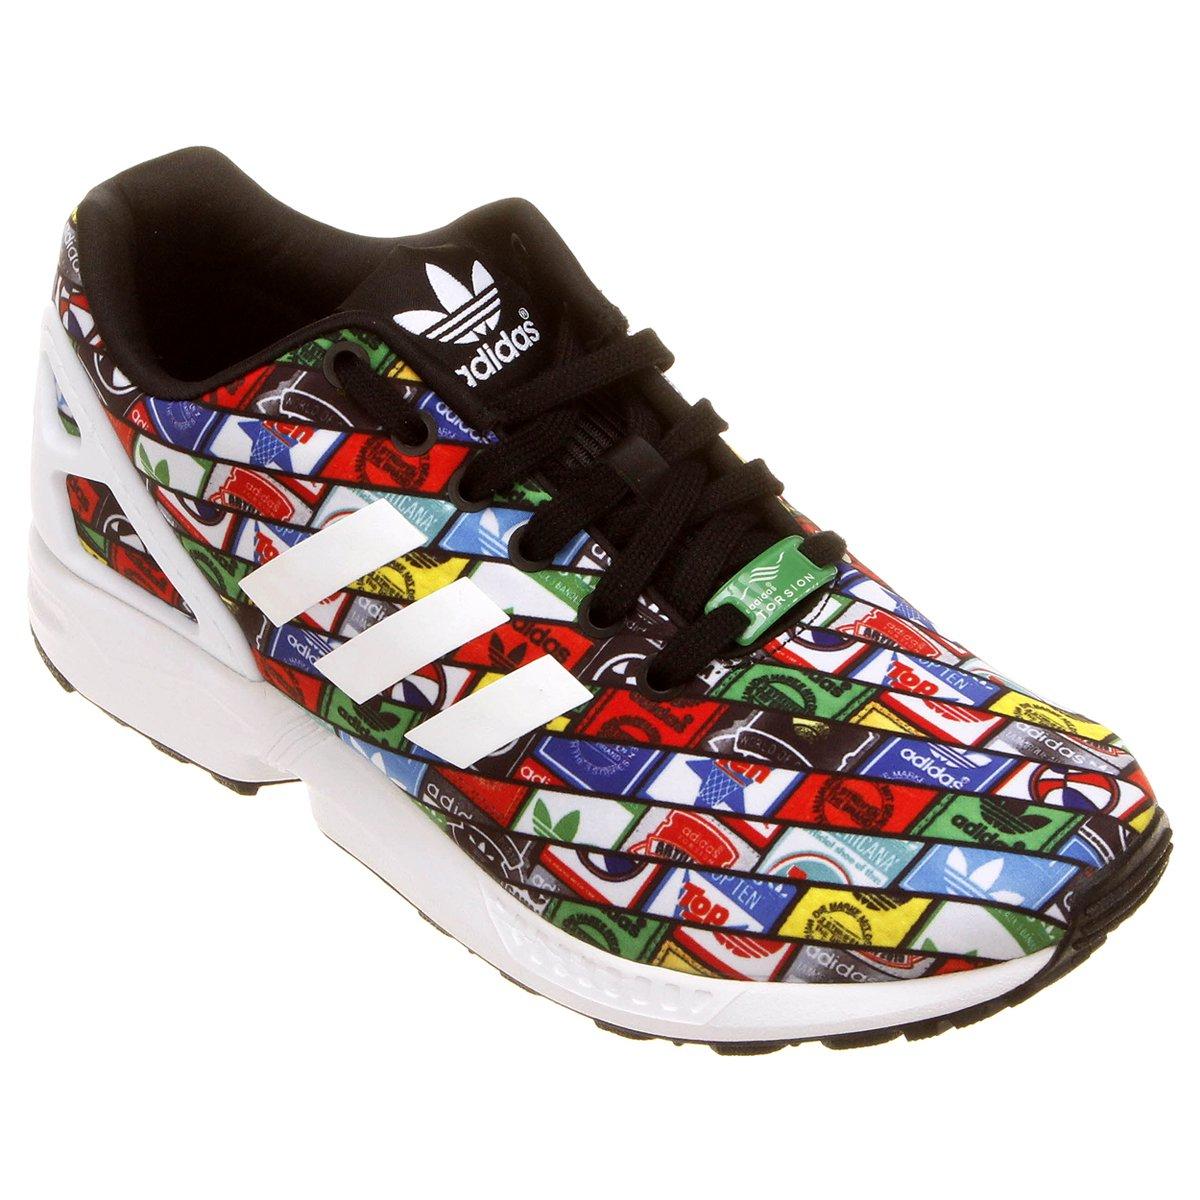 8d6c97ffa0b17 ... sale tênis adidas zx flux pretobranco fee35 f8202